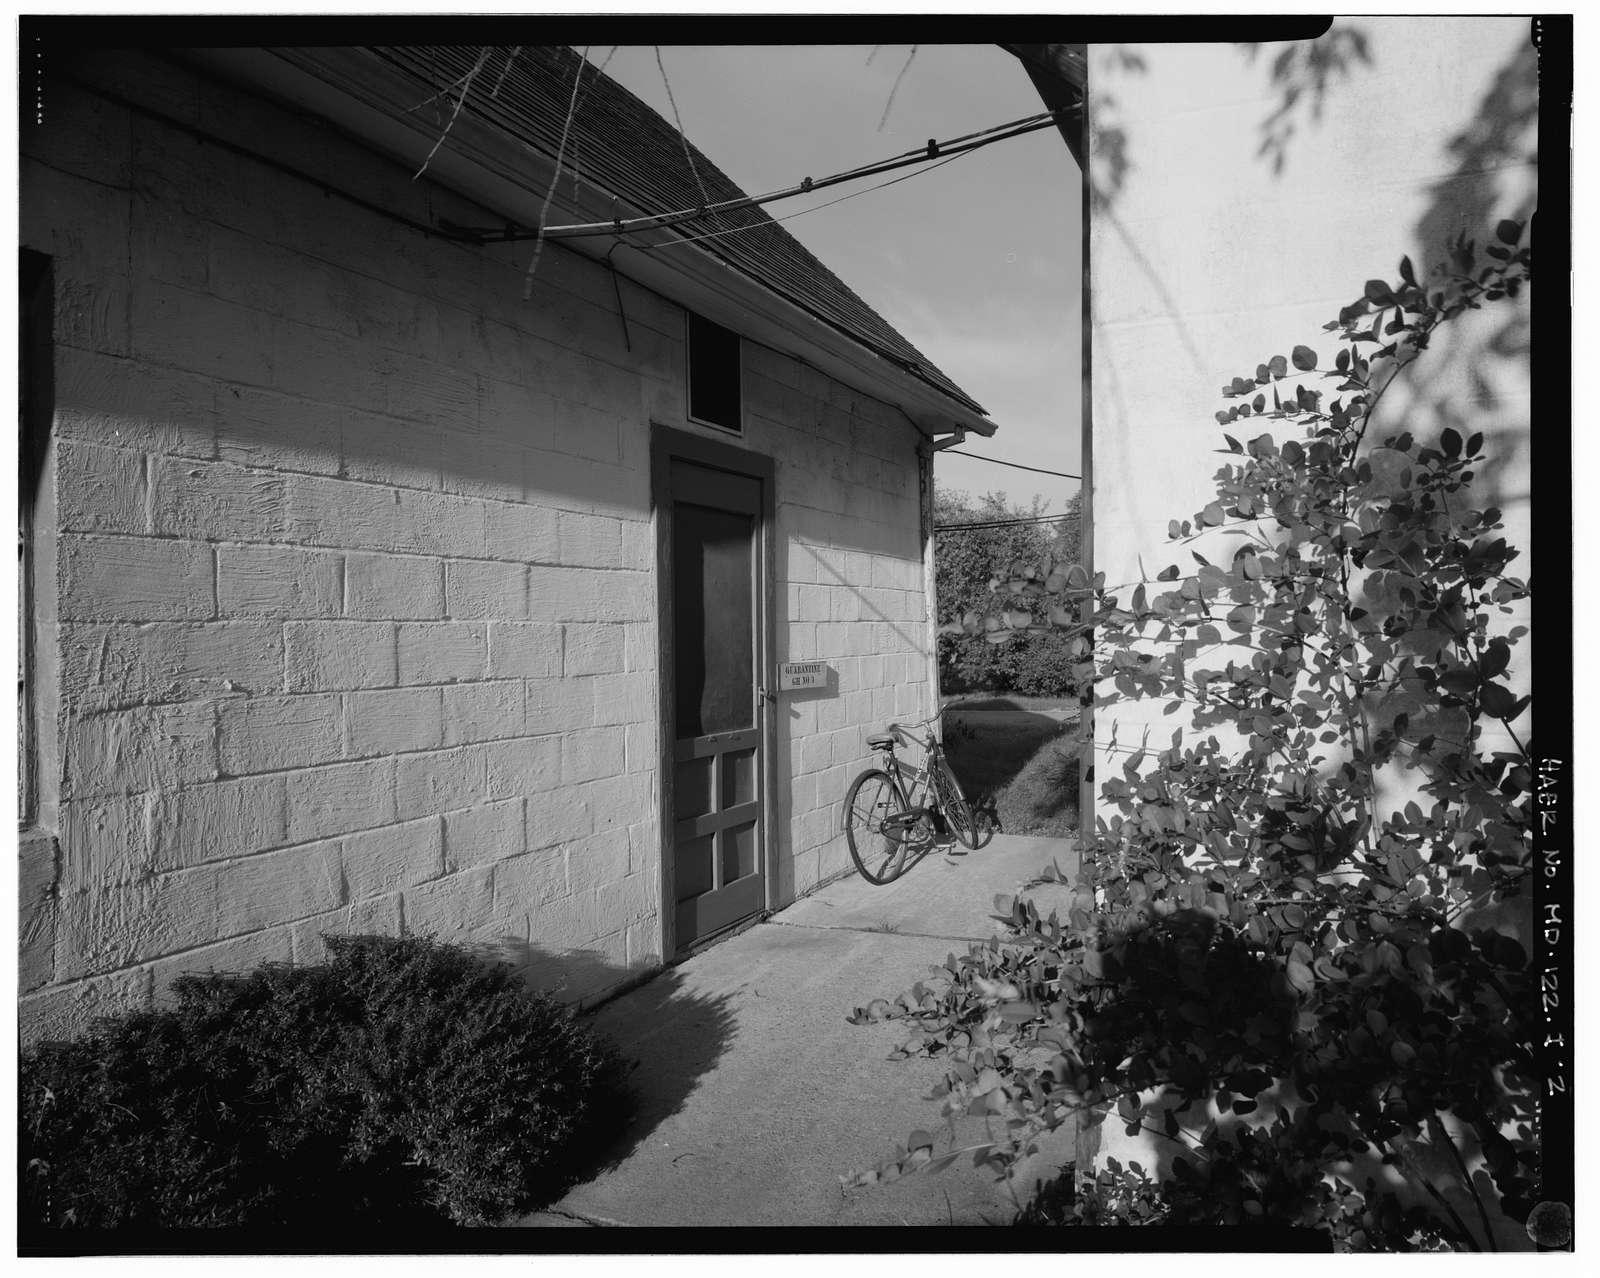 U.S. Plant Introduction Station, Quarantine Headhouses & Greenhouses, 11601 Old Pond Road, Glenn Dale, Prince George's County, MD